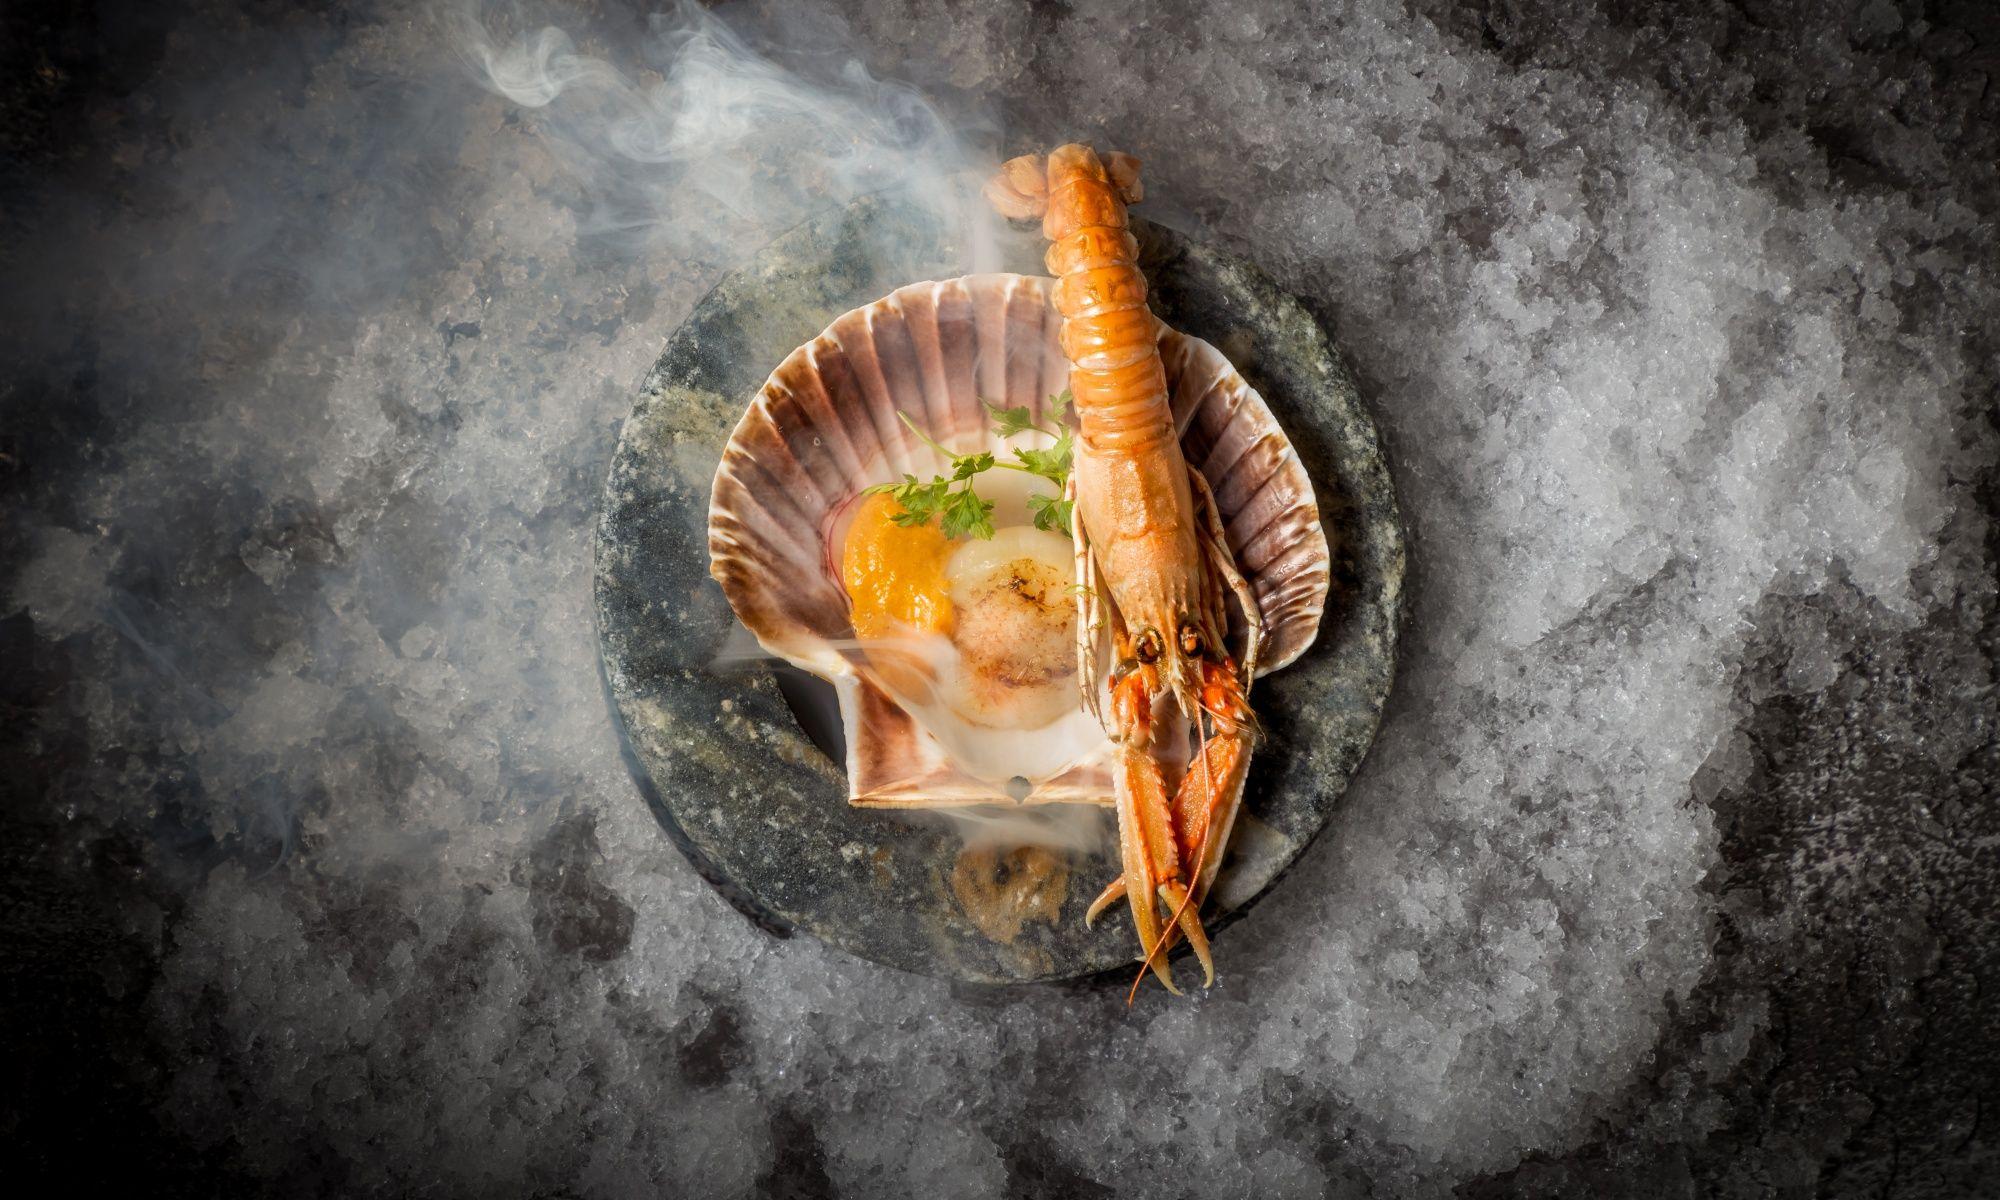 Hong Kong Restaurant News: Caviar Tasting At Neighborhood, Finds' Nordic Menu And More